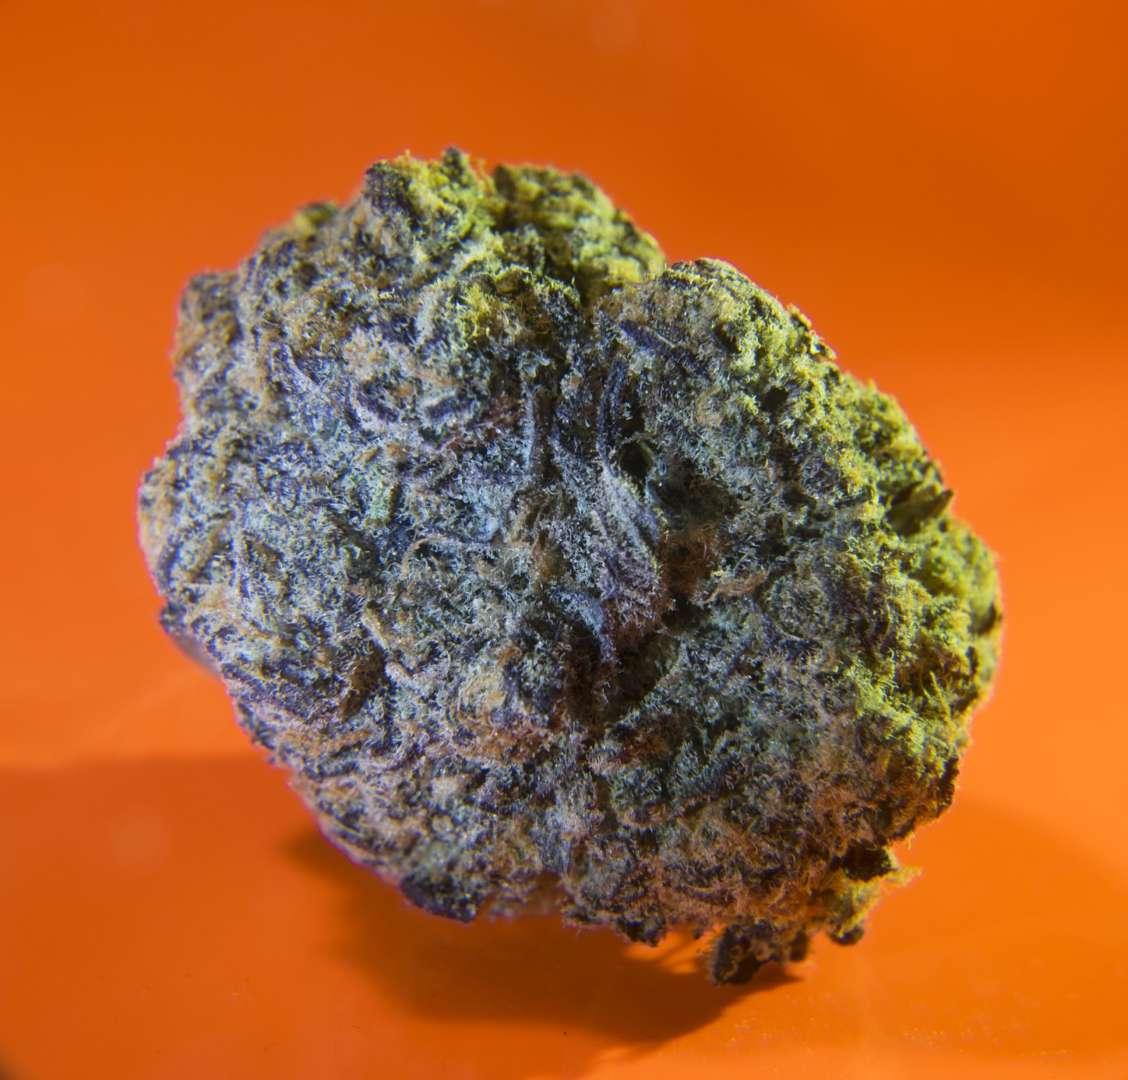 popular cannabis strains in san francisco